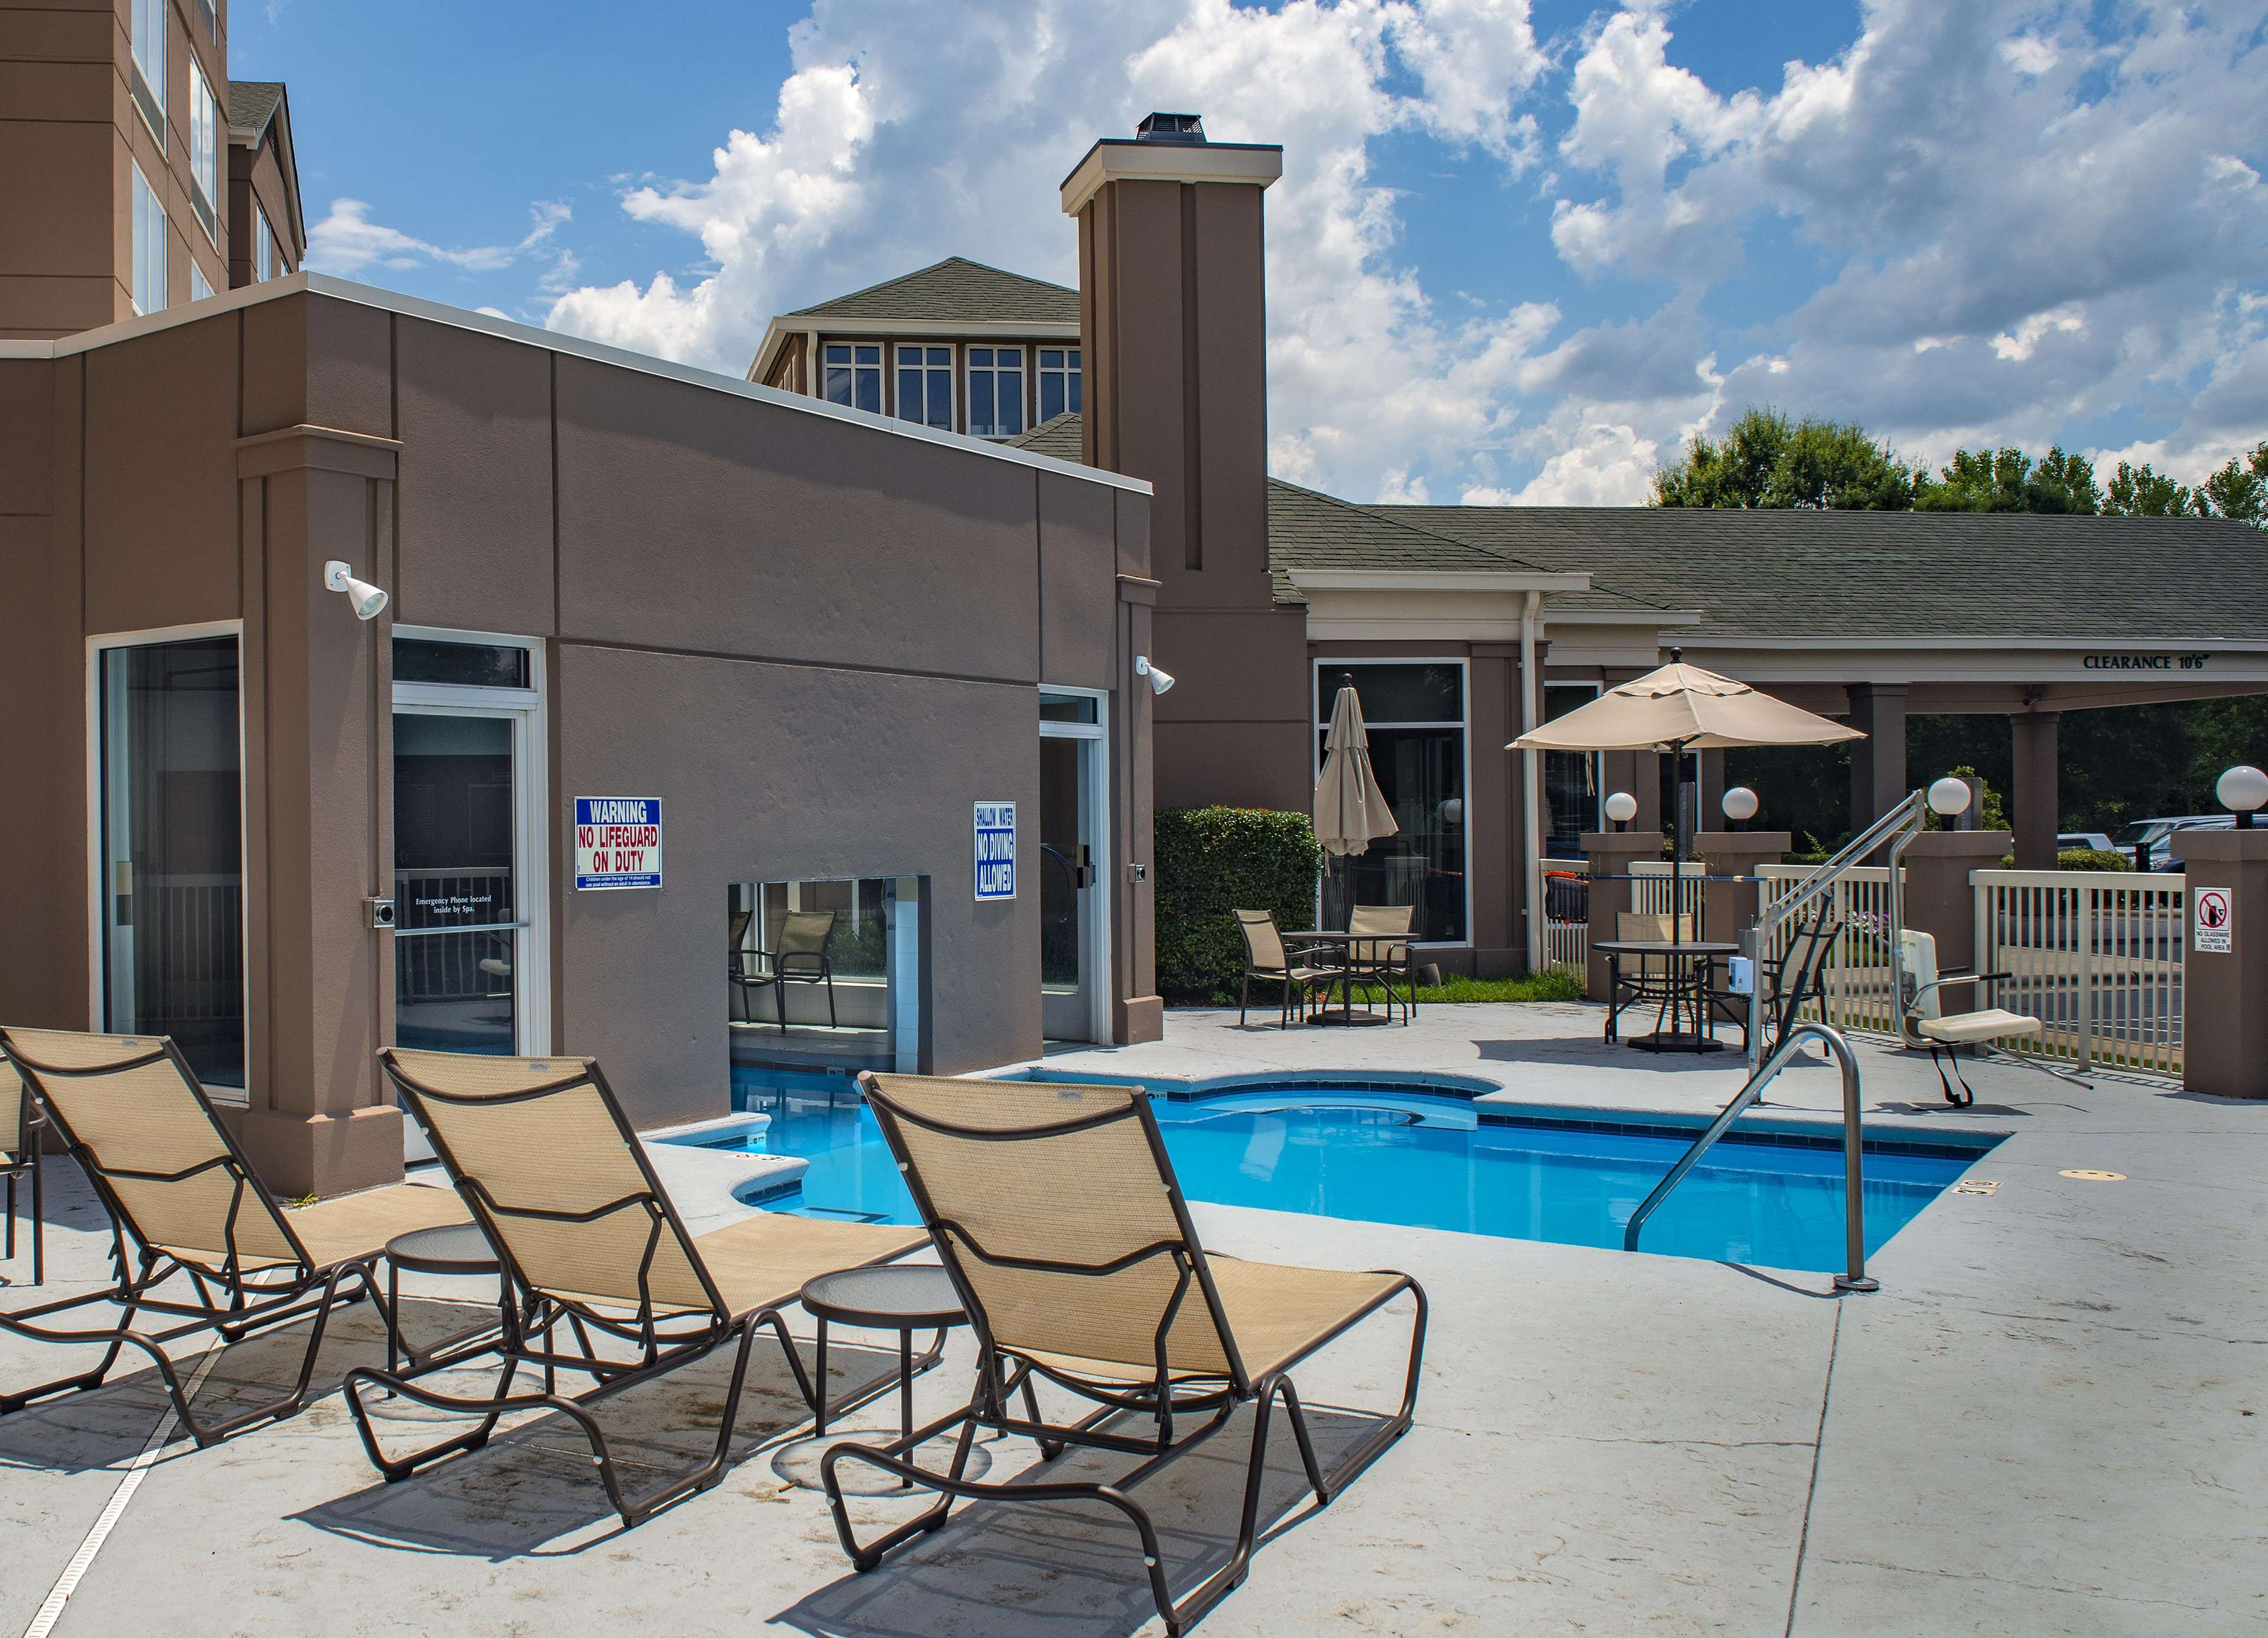 Hilton garden inn charlotte pineville pineville north - Hilton garden inn charlotte pineville ...